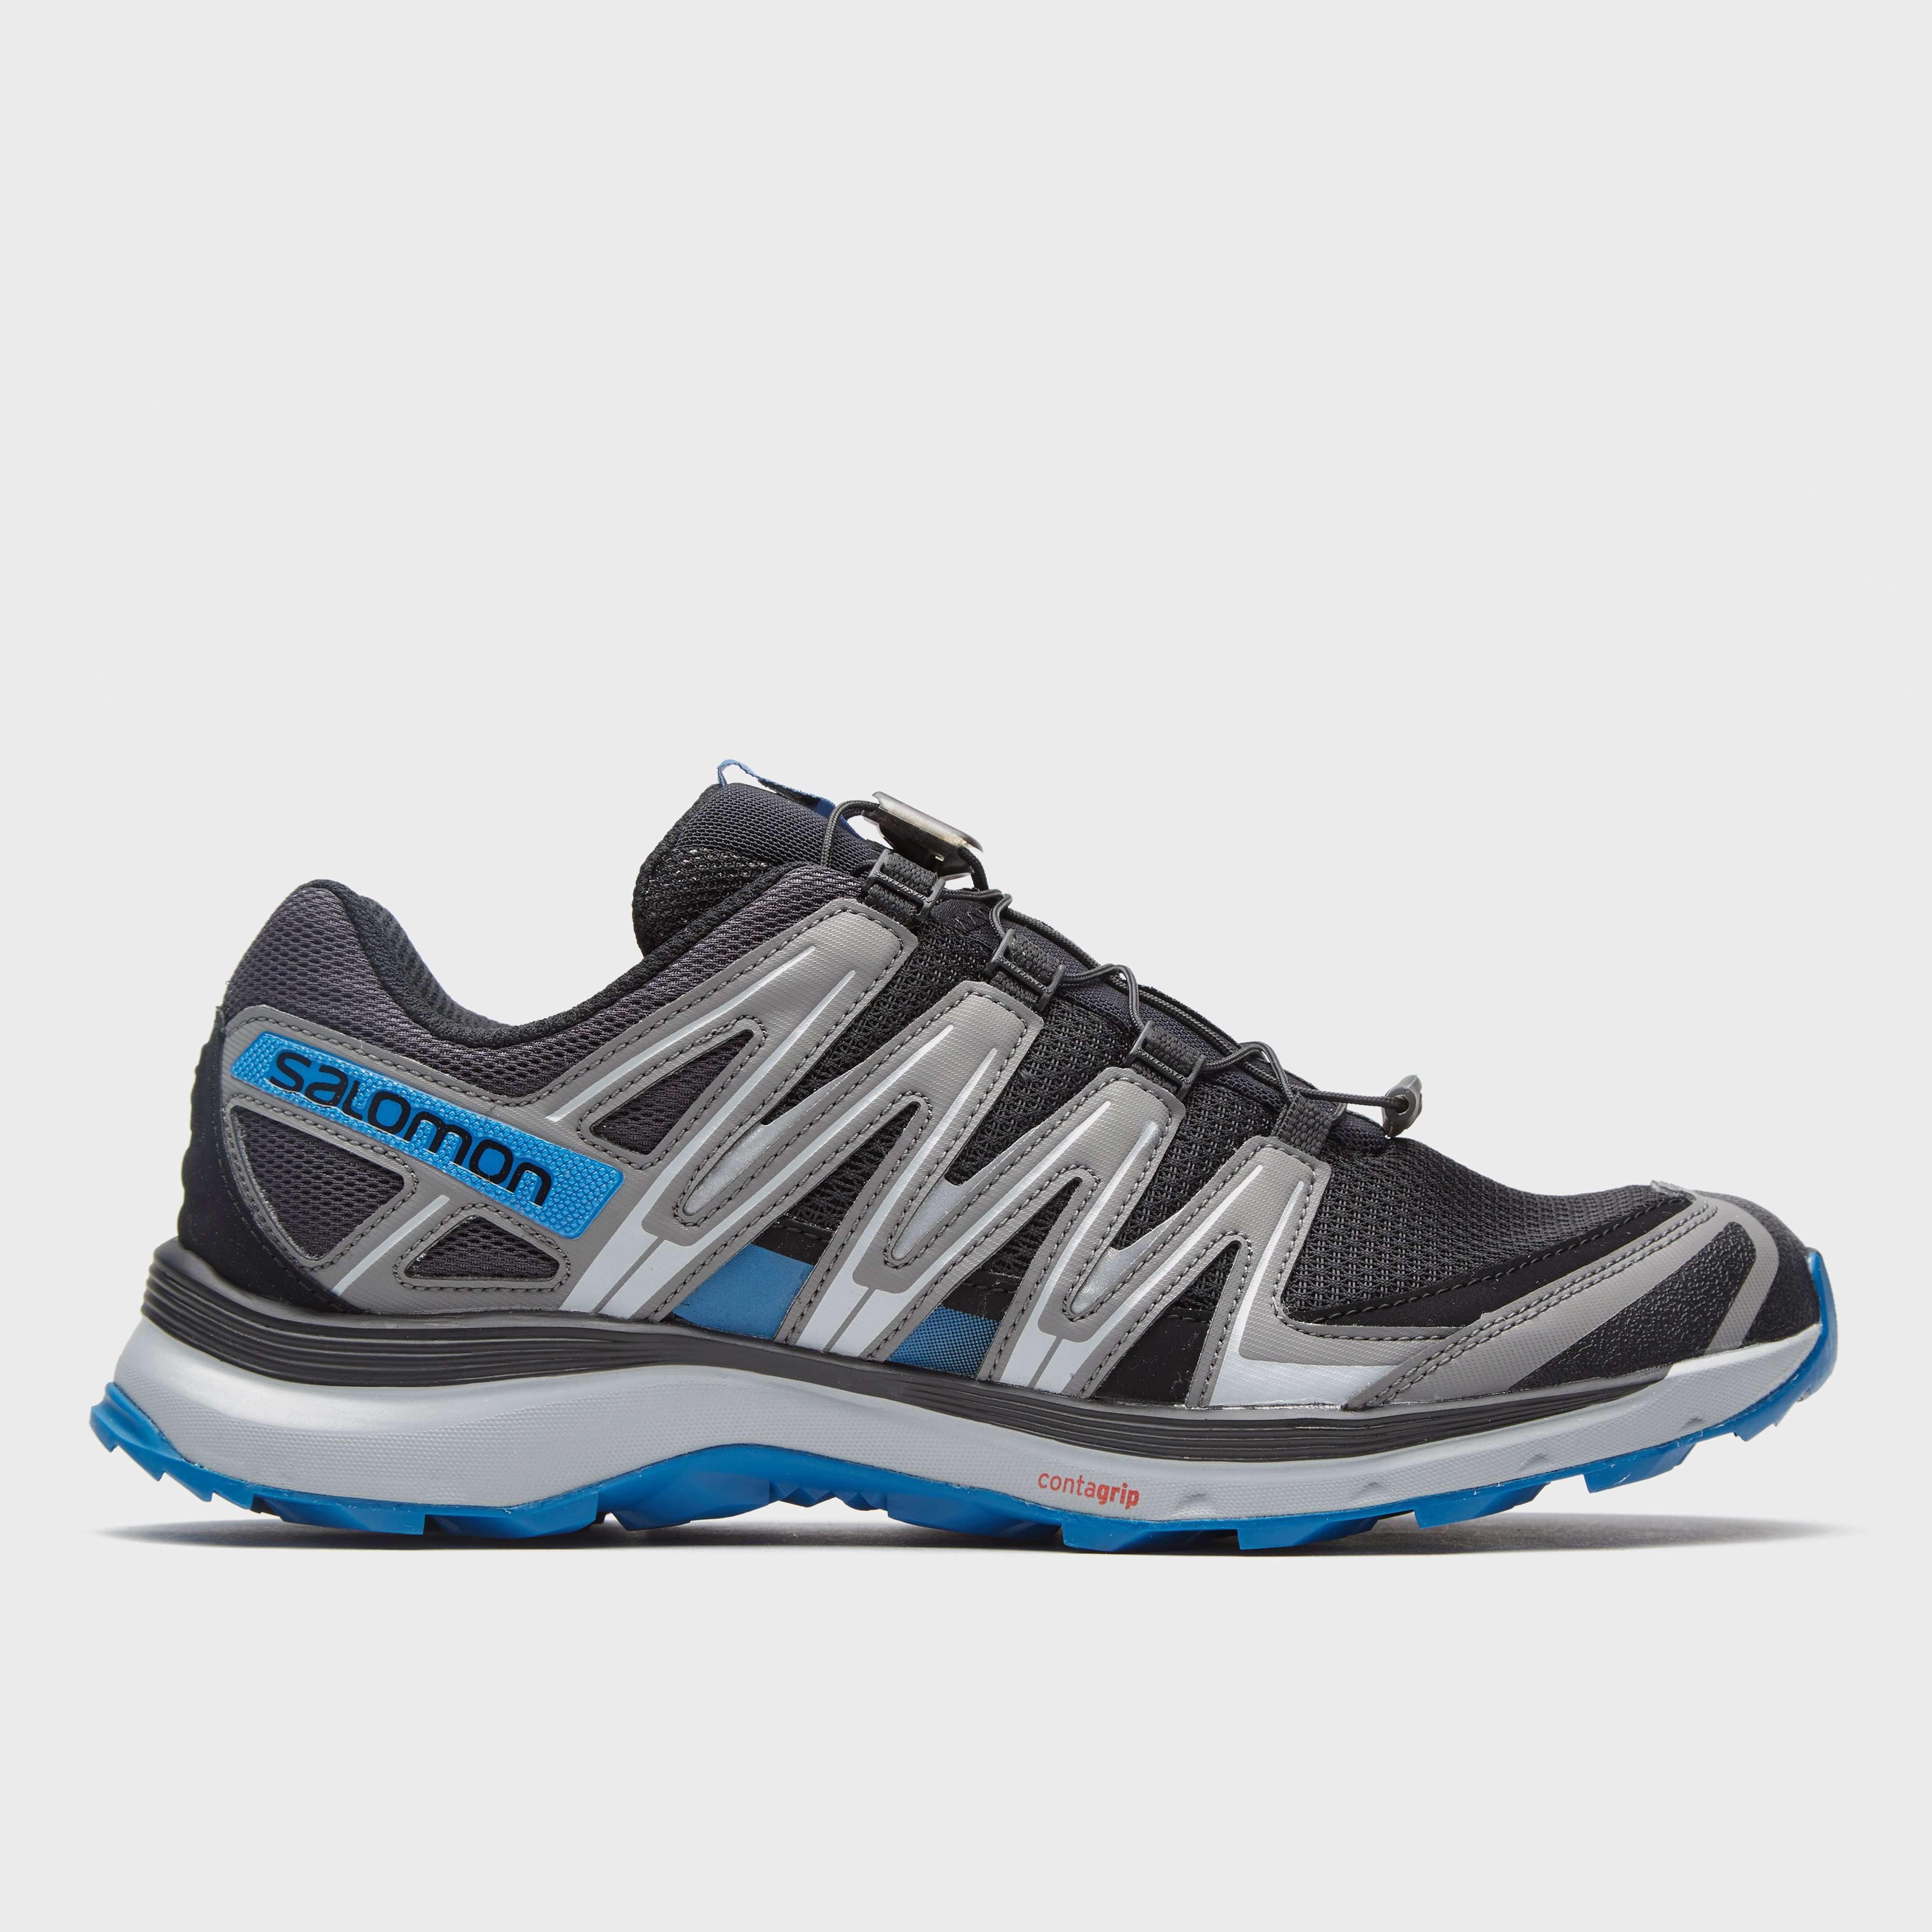 SALOMON Men's XA LITE Shoes